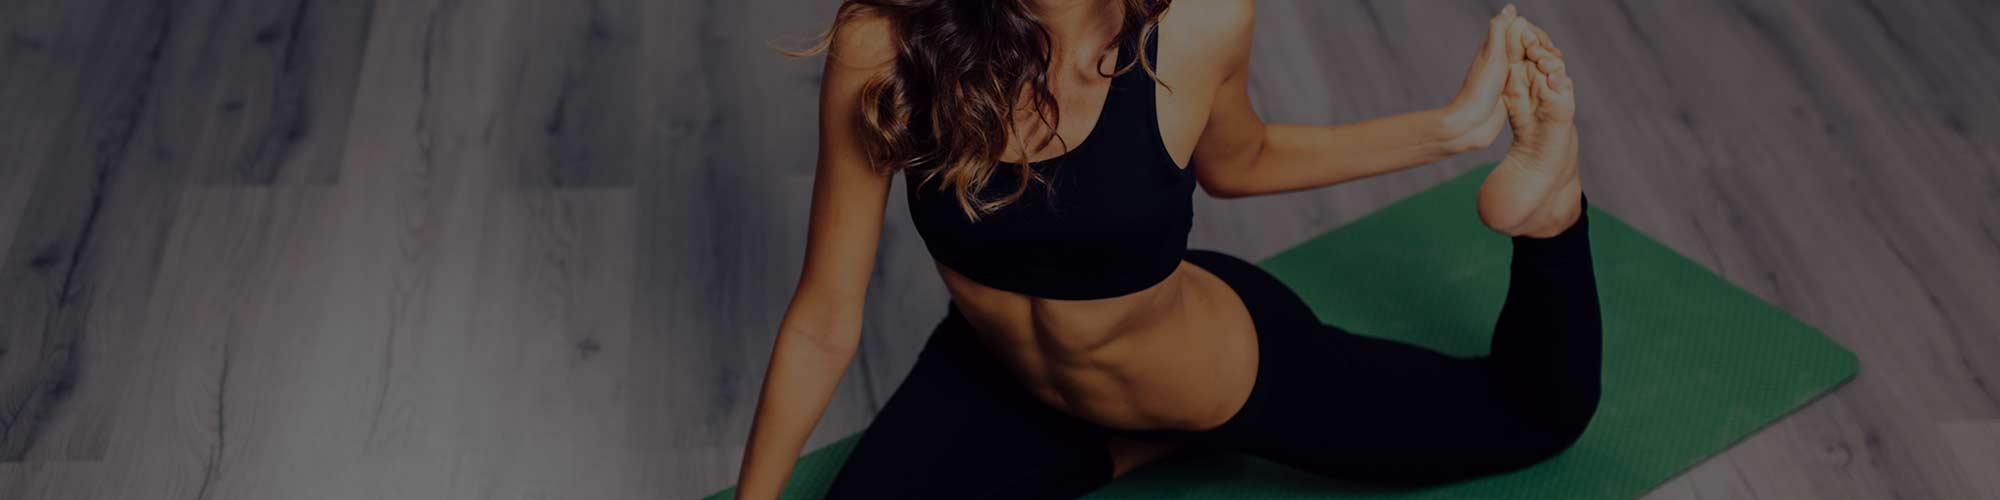 Yoga / Pilates